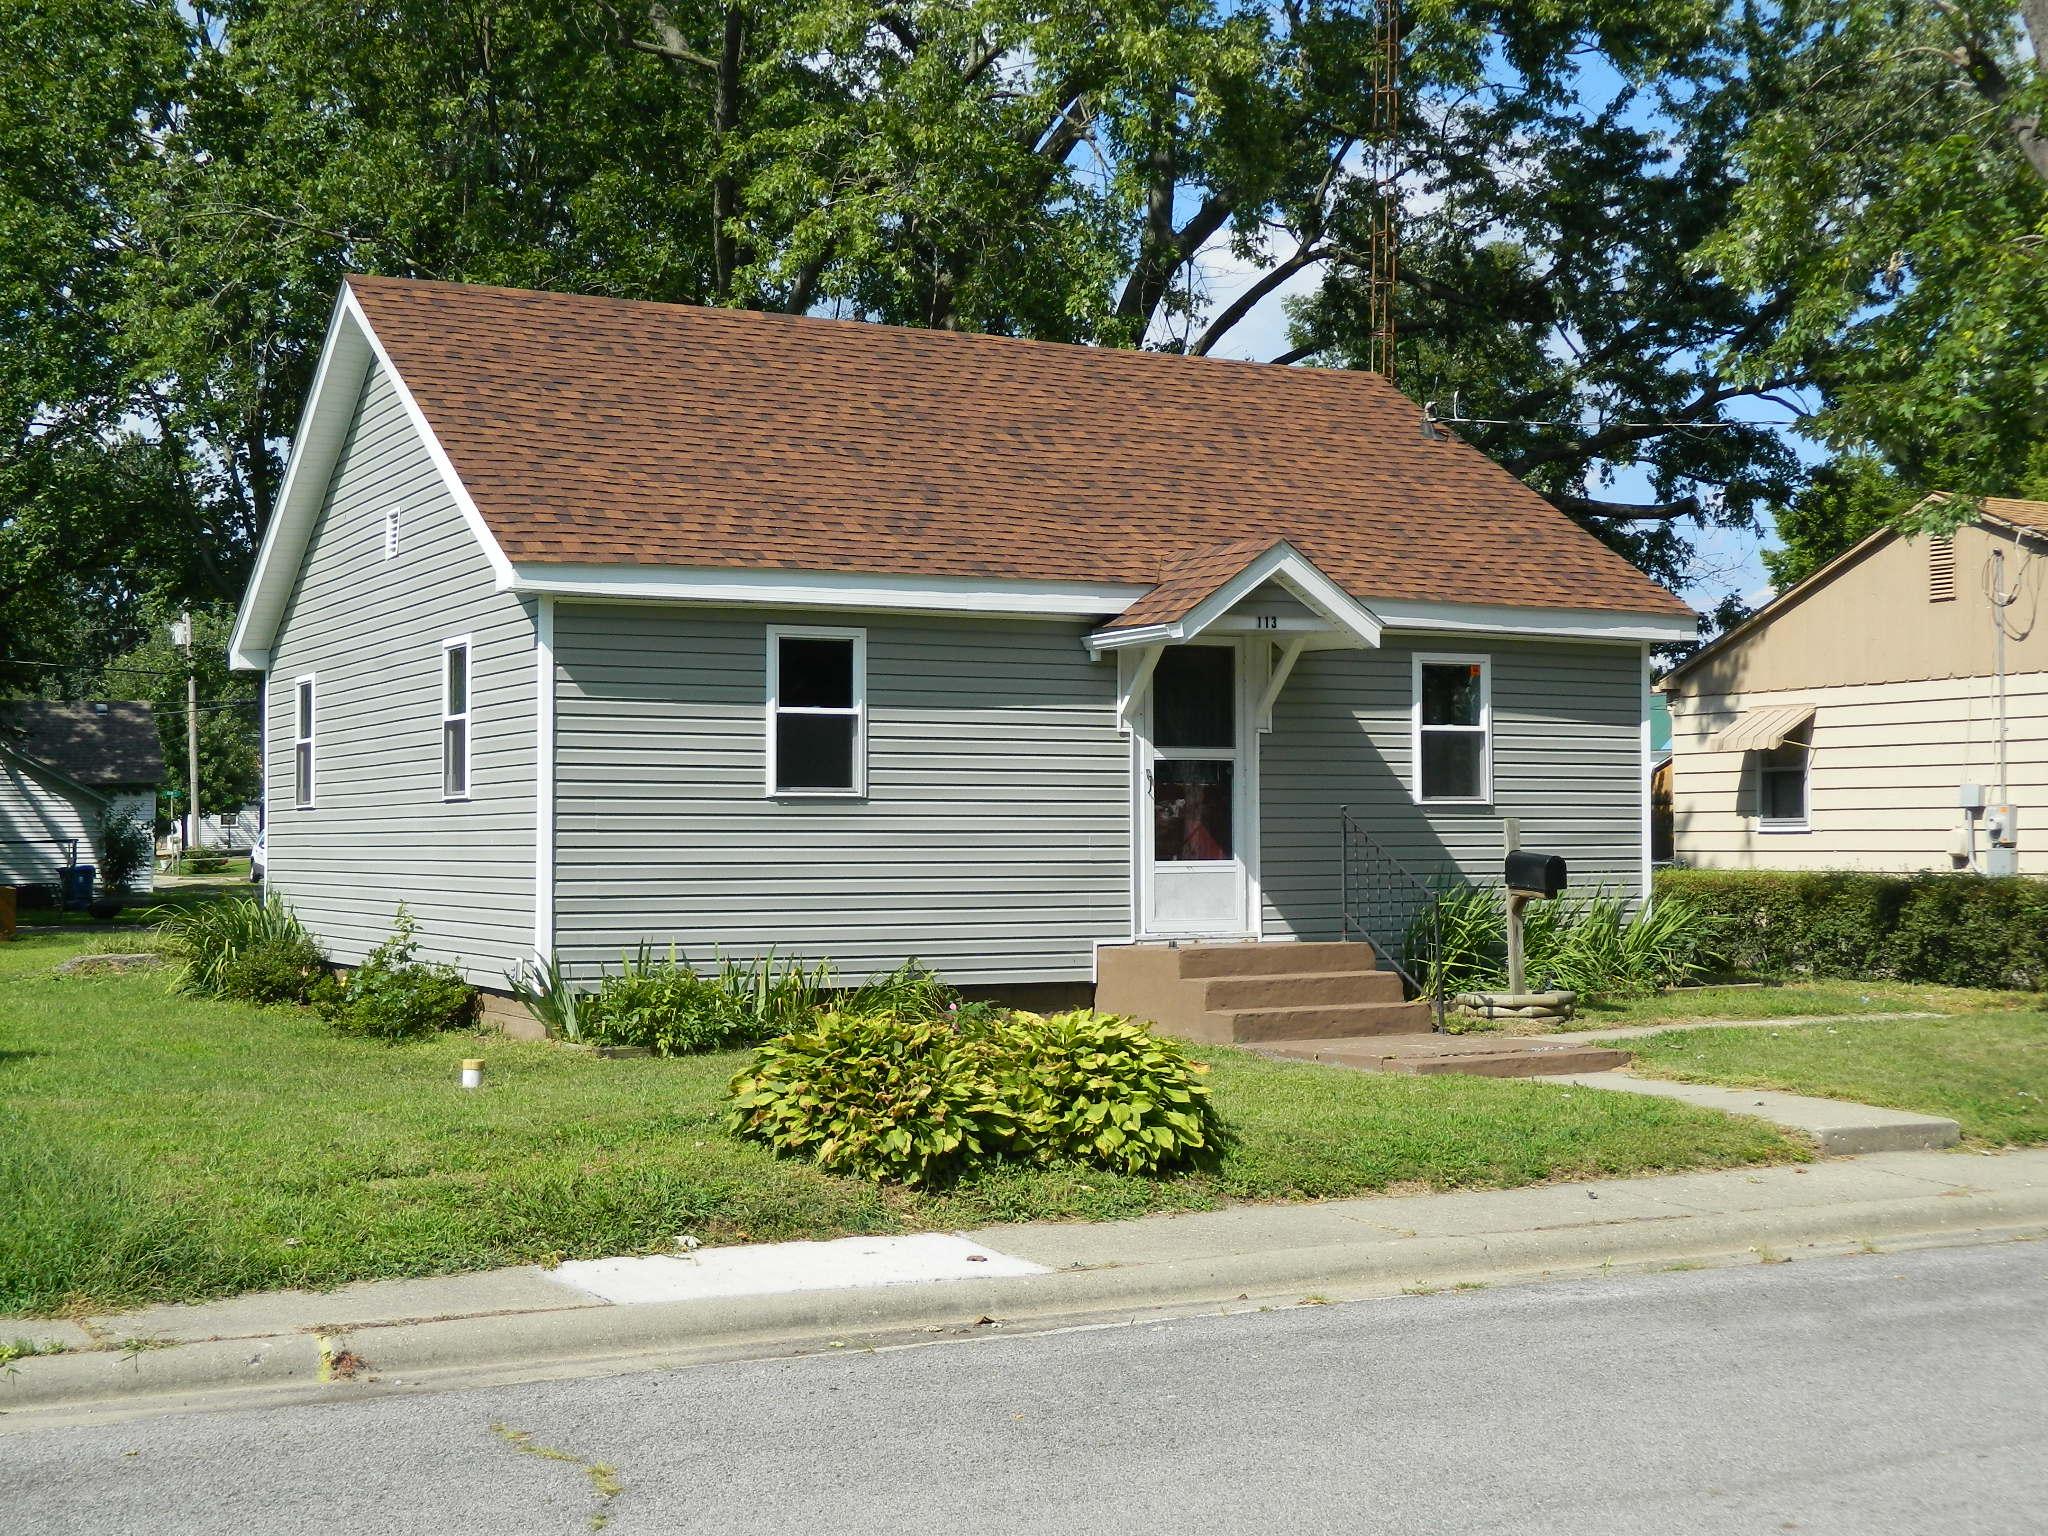 Wayne County Il Homes For Sale Fairfield Burnt Prarie